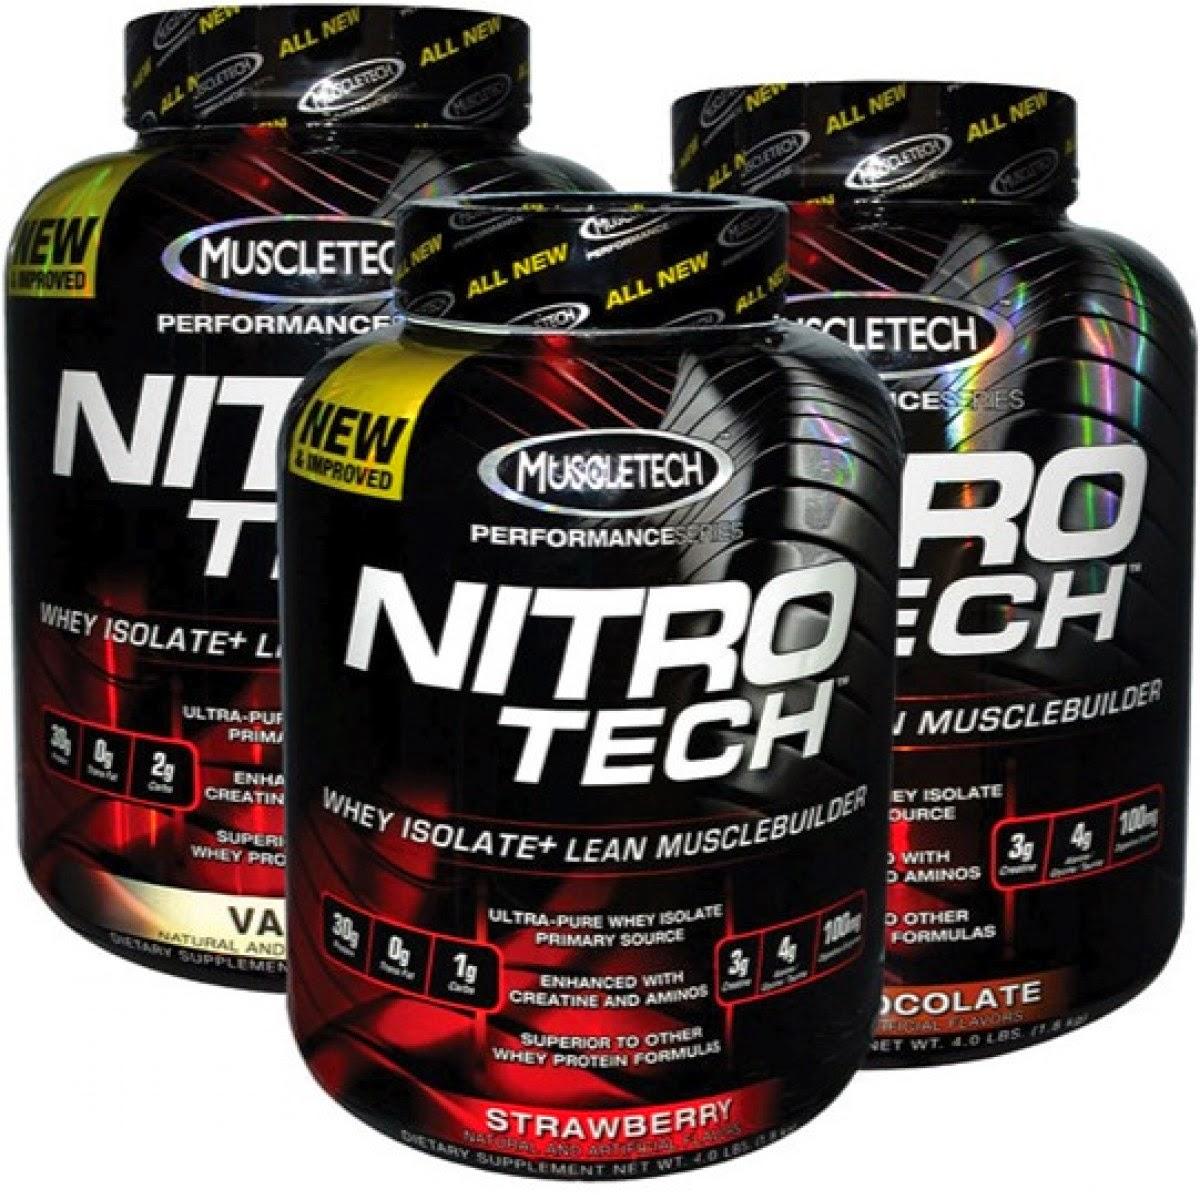 MuscleTech NITRO-TECH Reviews - Bodybuildingcom